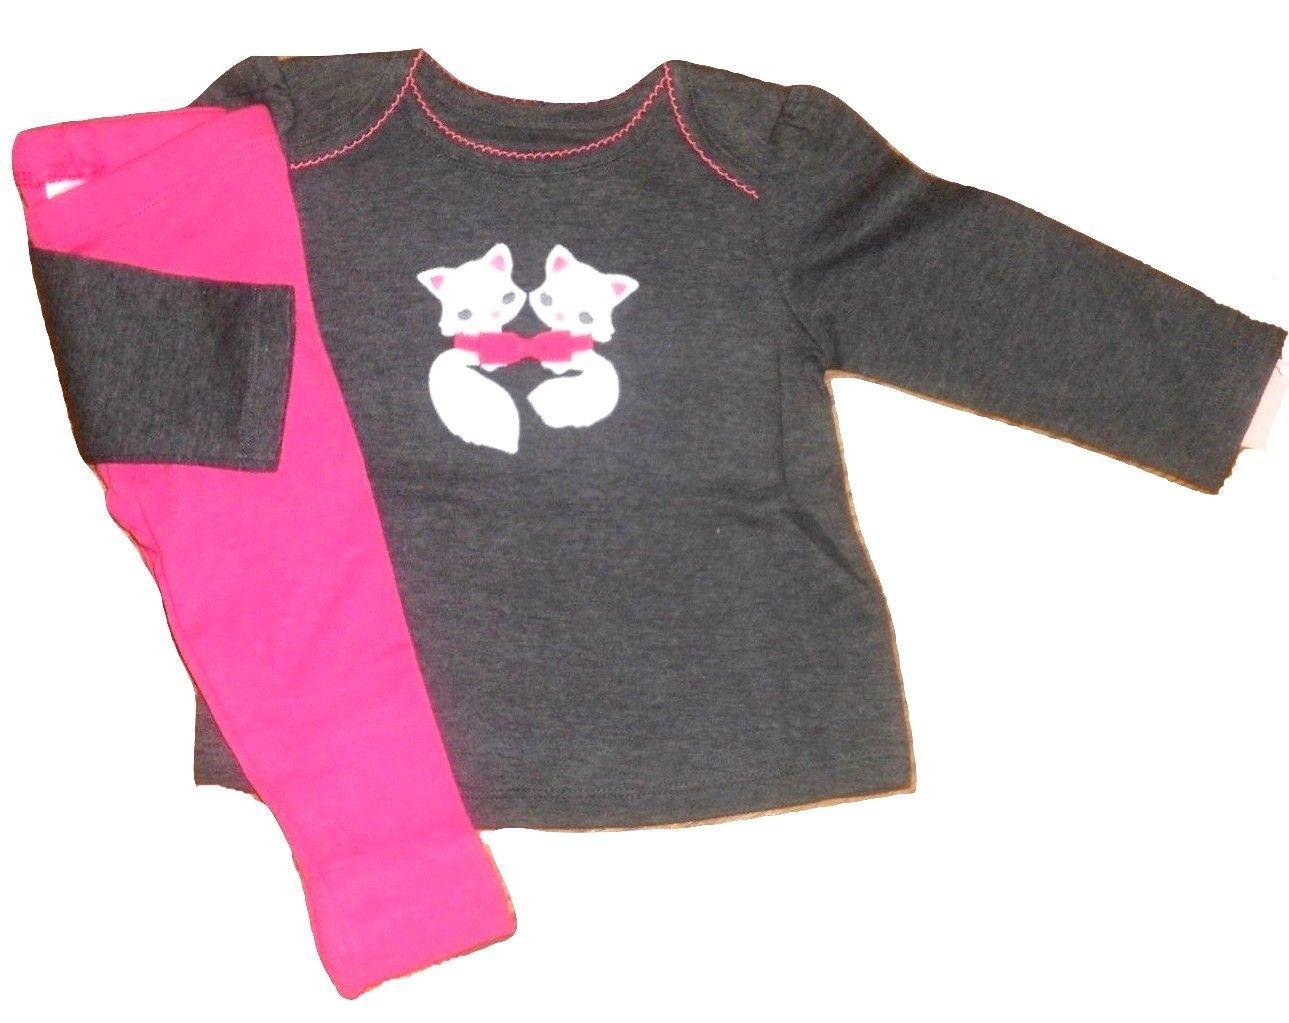 001f3eeecc5ff Gymboree Baby Girls Arctic Fox Tee Leggings and 50 similar items. S l1600